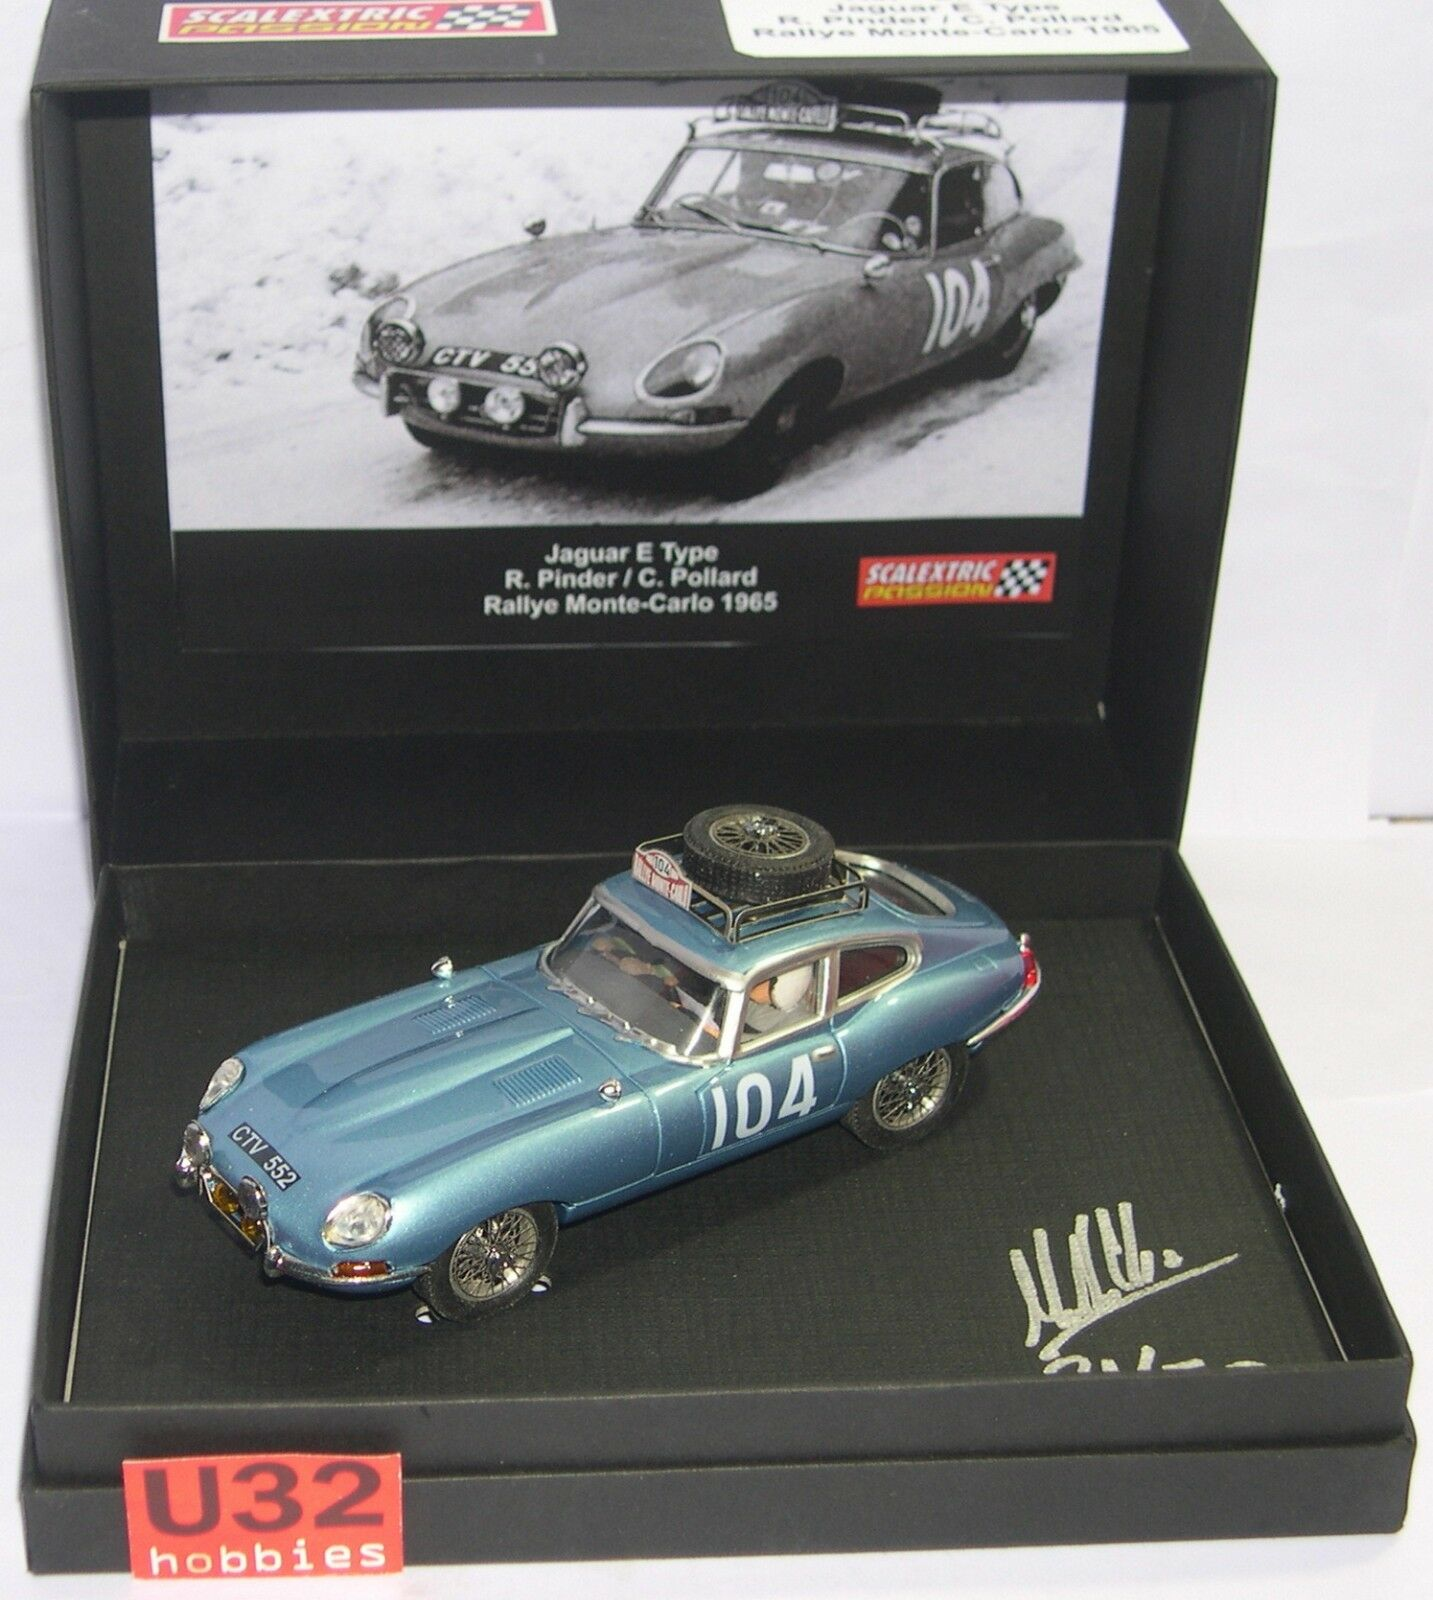 Scalextric Passion Sp031 Sp031 Sp031 Jaguar E Type Rally Monte Carlo 1965 R.pinder 7ed653